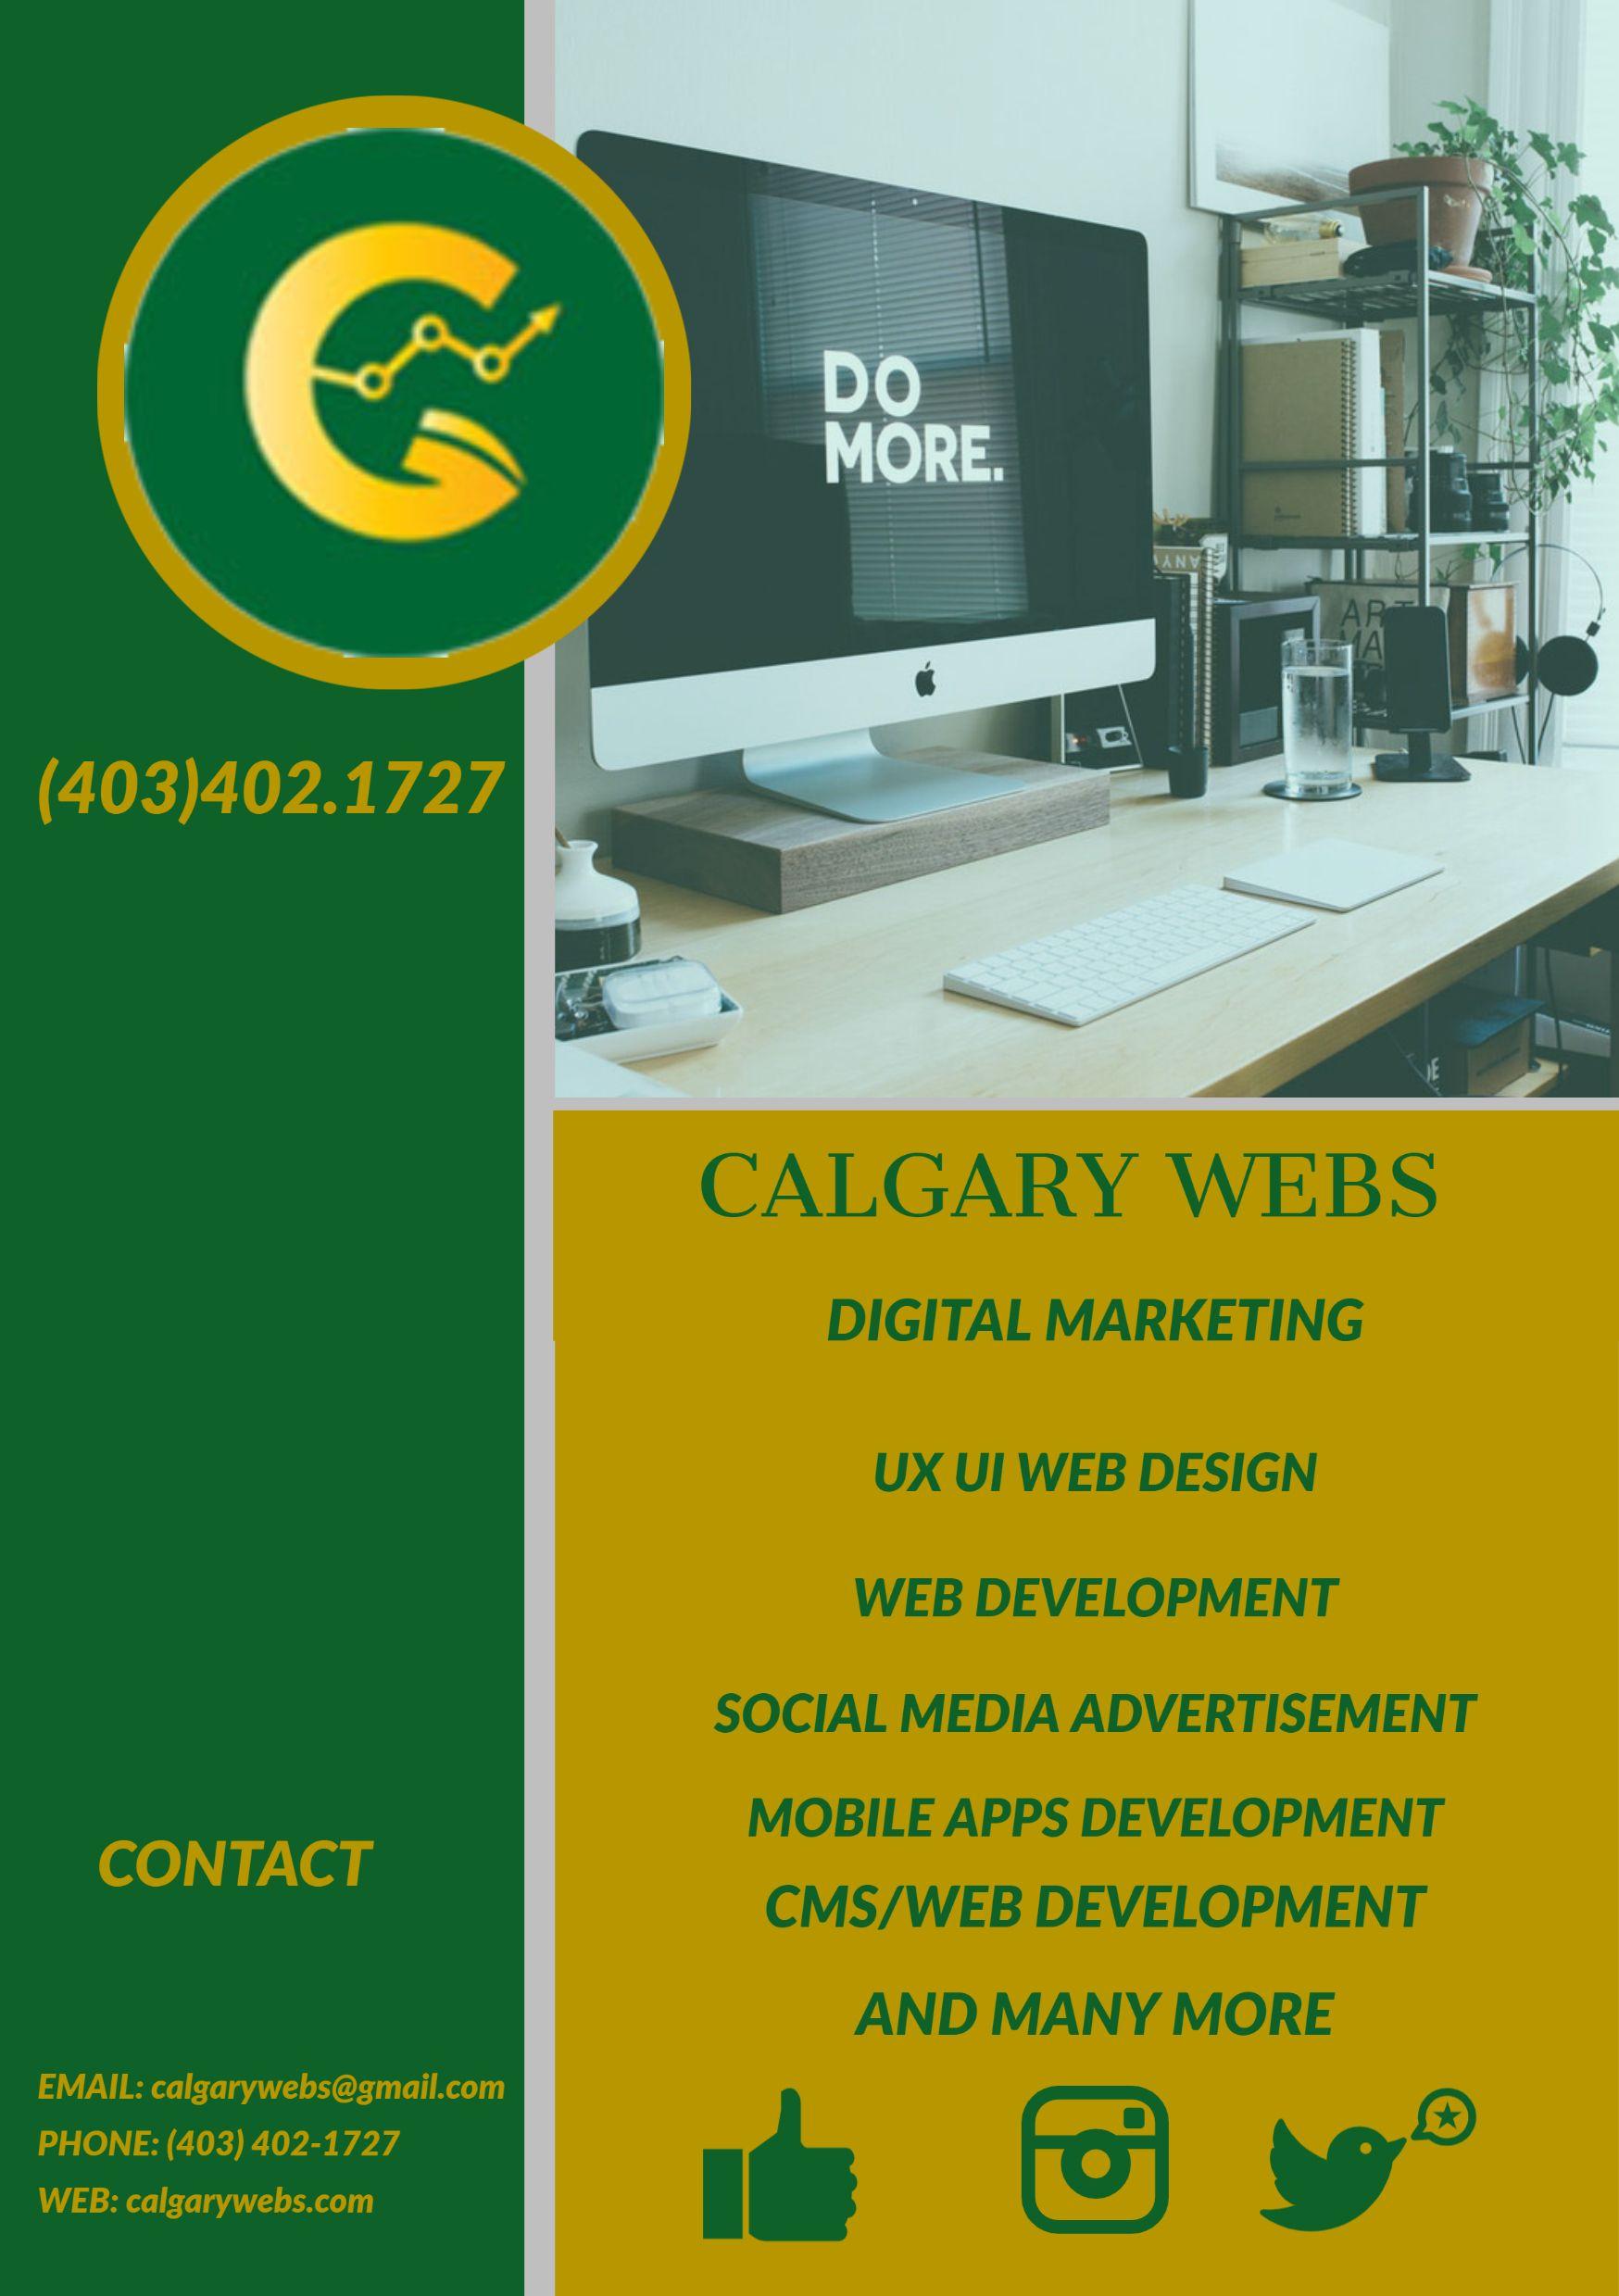 Calgary Webs In 2020 App Development Companies Digital Marketing Company Mobile App Development Companies